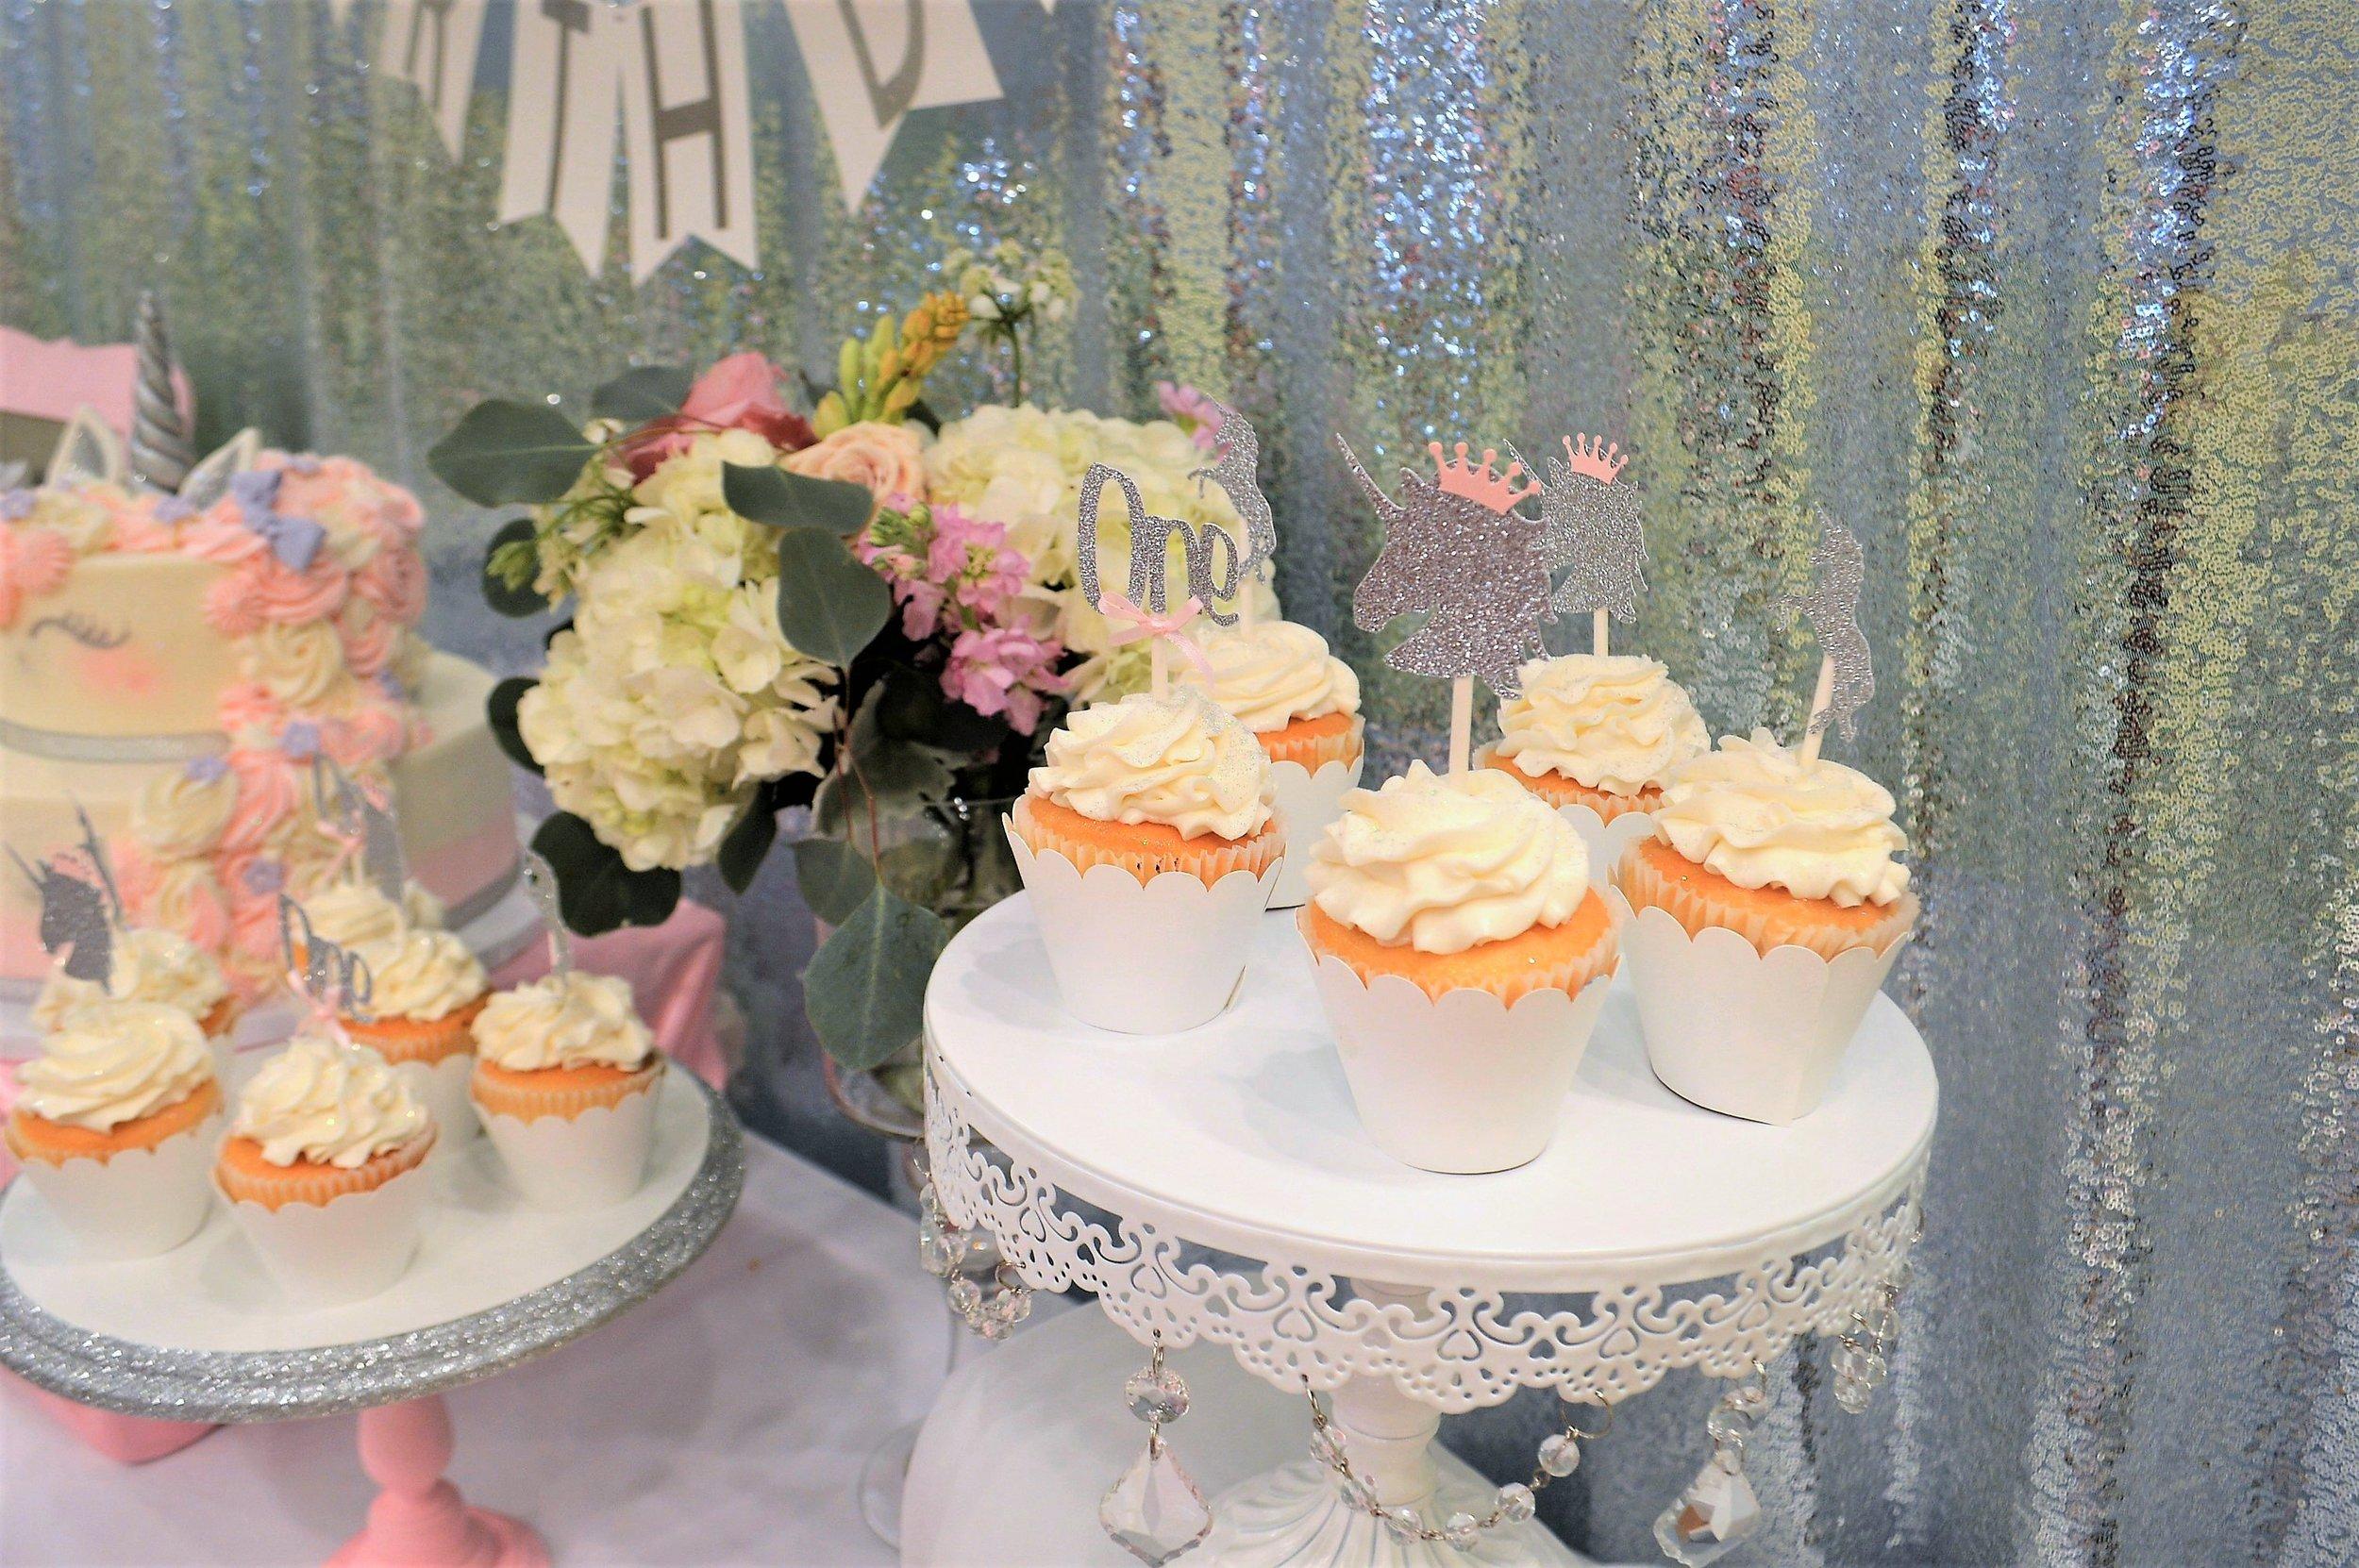 Unicorn birthday party-unicorn cupcakes-unicorn cupcake toppers-unicorn first birthday-unicorn-unicorn party ideas-unicorn birthday party decor-first birthday party-www.SugarPartiesLA.com.jpg